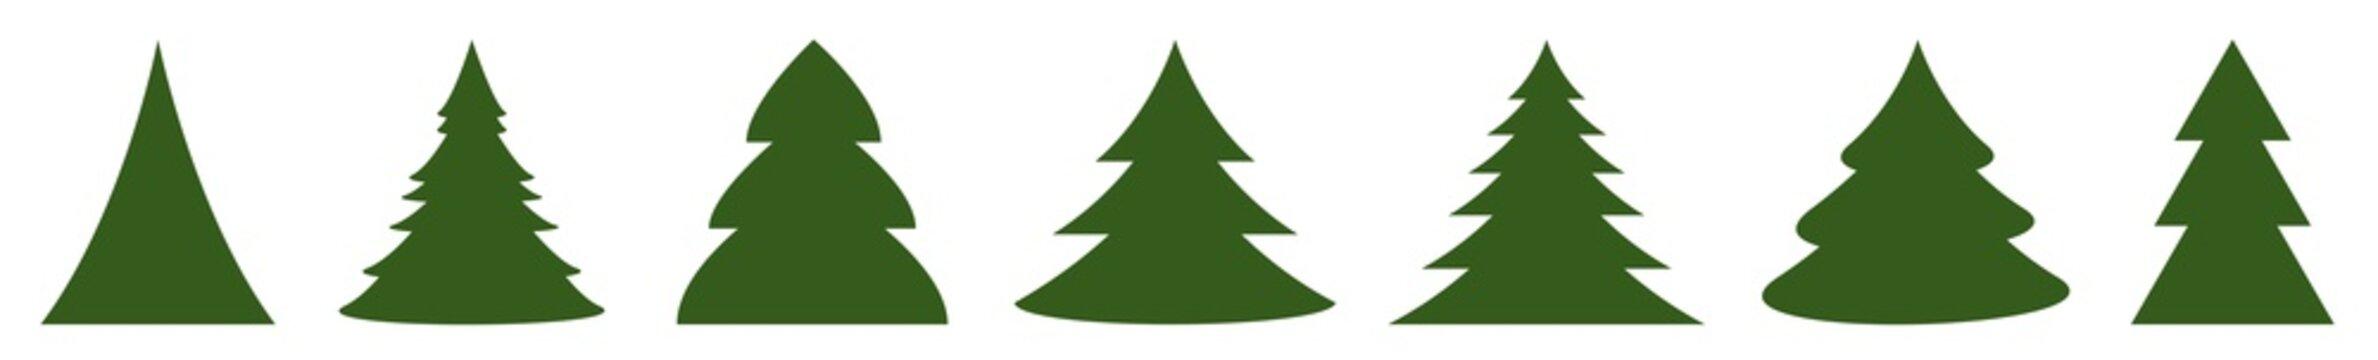 Christmas Tree Green Icon | Fir Tree Illustration | x-mas Symbol | Logo | Isolated Variations